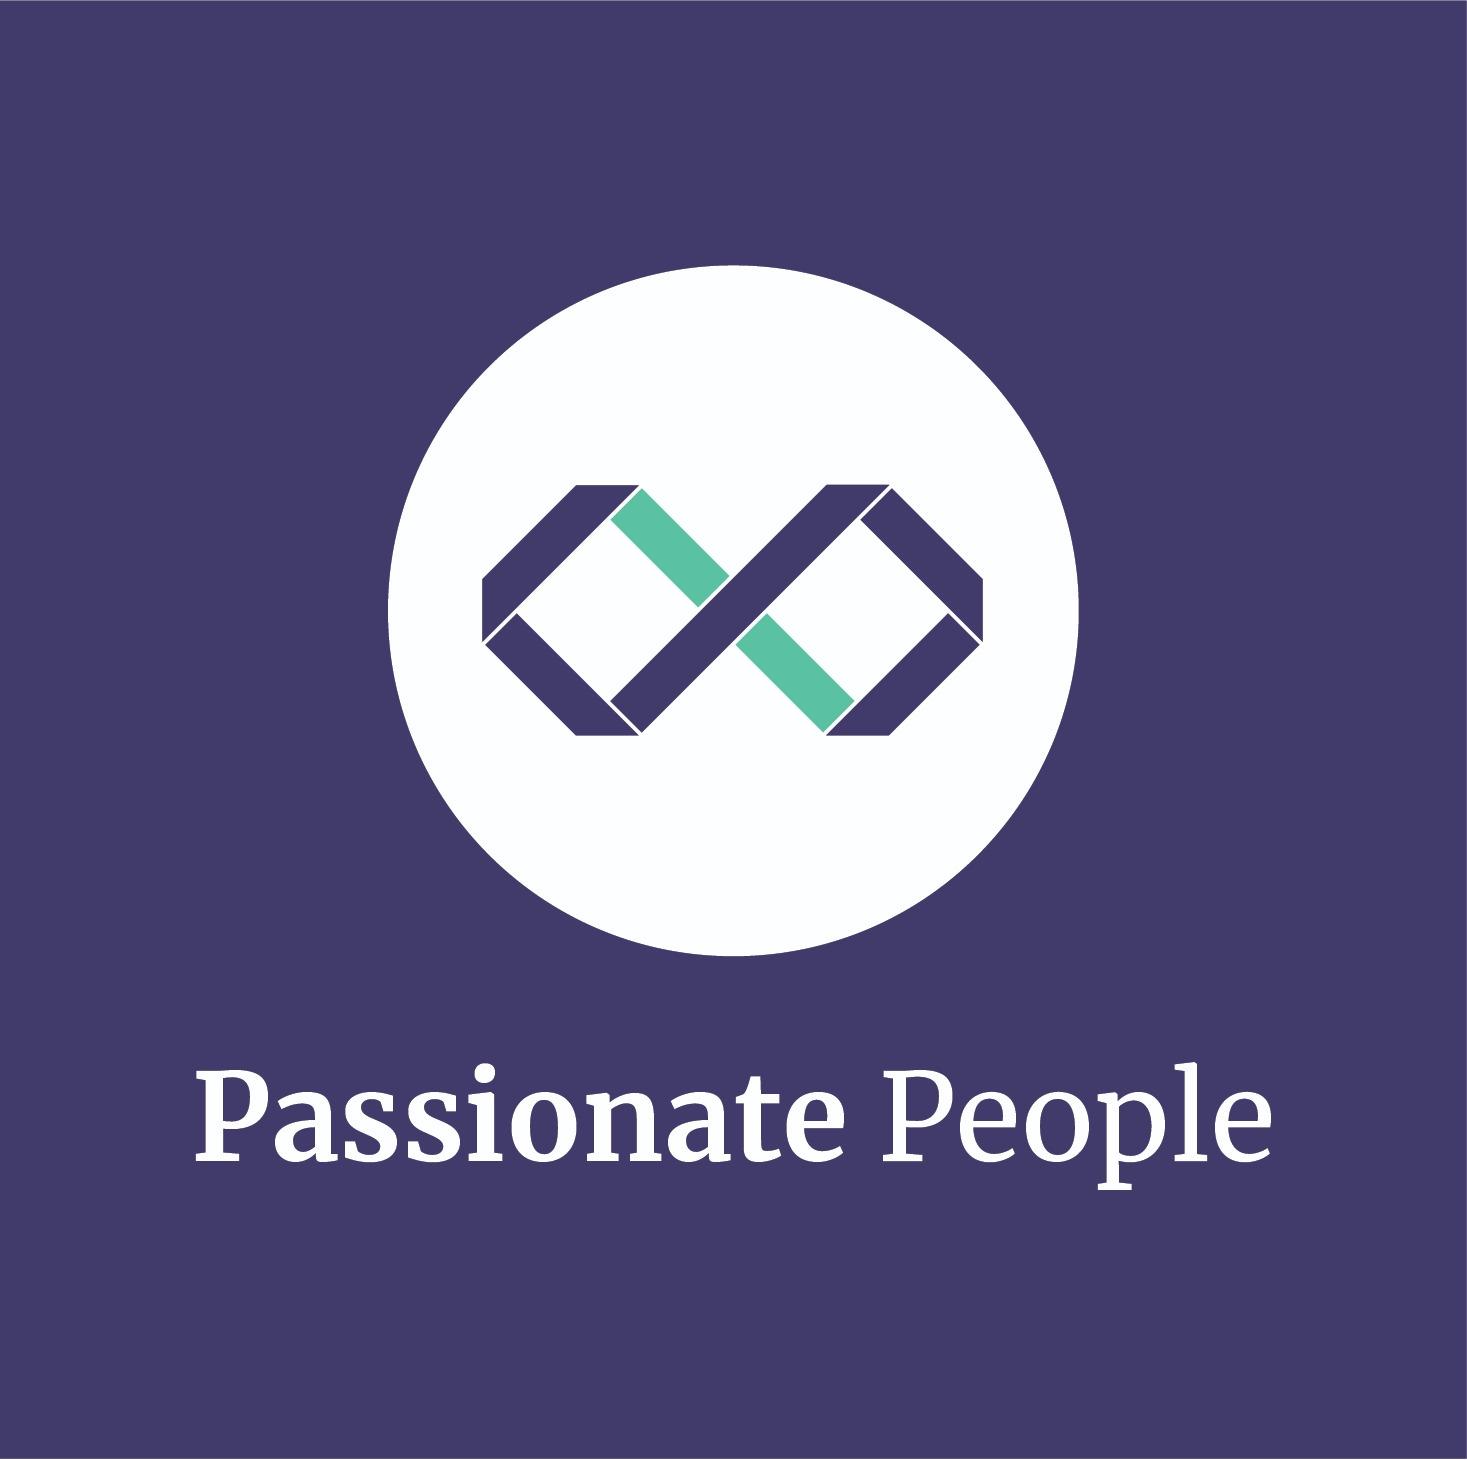 Passionate People sponsor